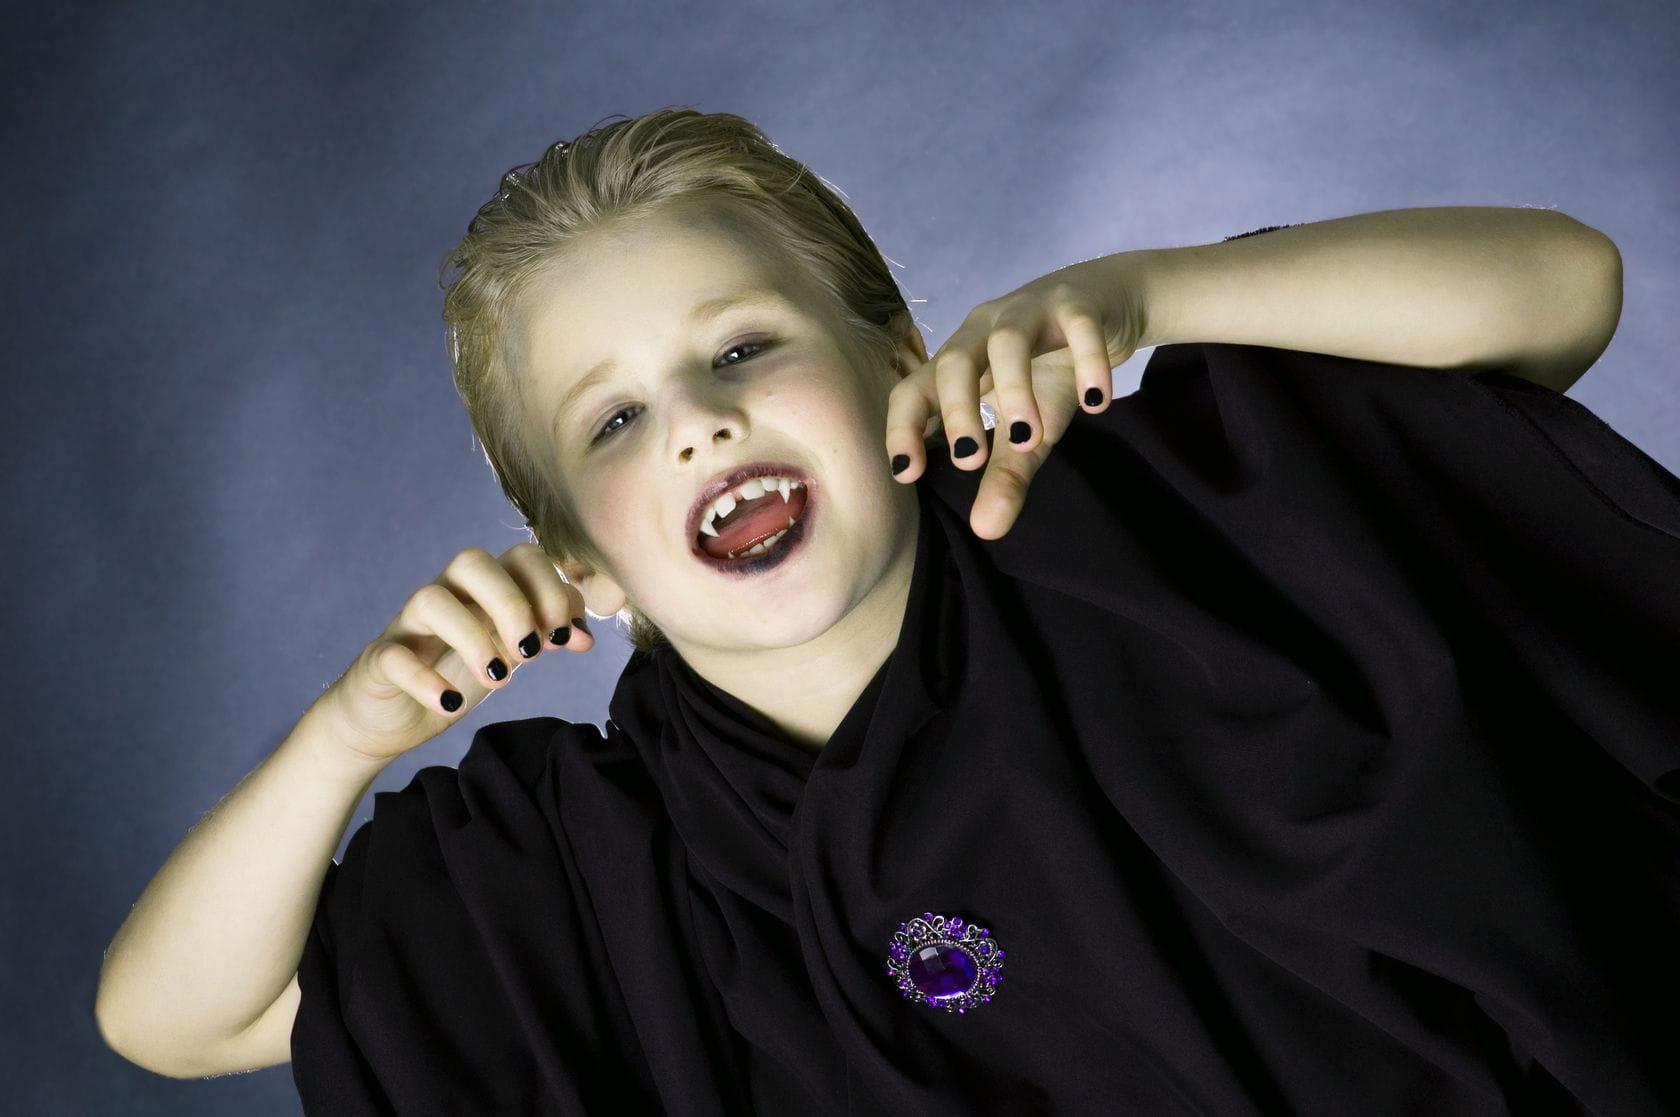 Comment maquiller mon enfant pour halloween - Omhullen een froid rouge ...